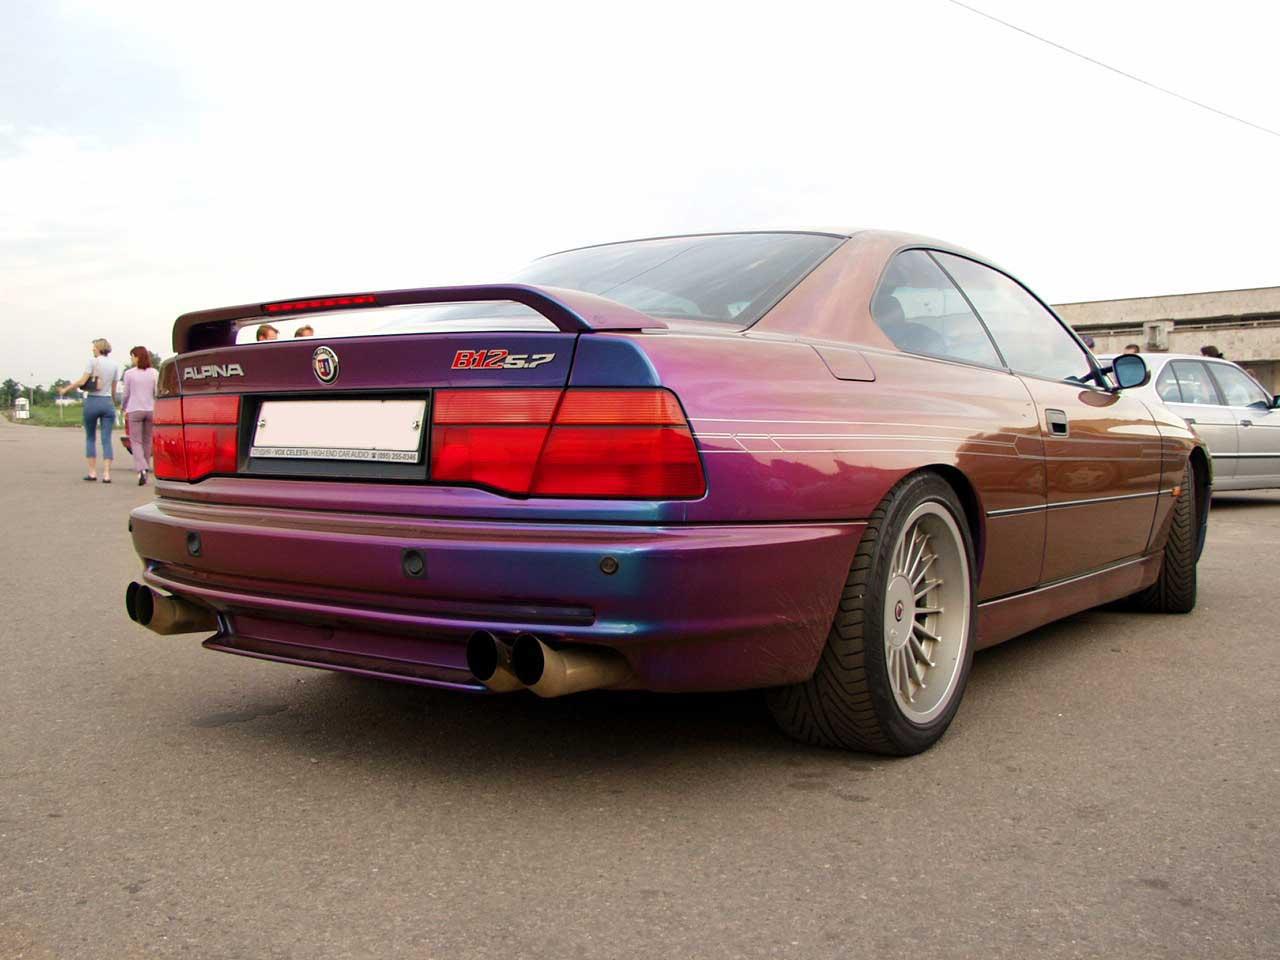 Alpina B12 5.7 photos - PhotoGallery with 4 pics| CarsBase.com